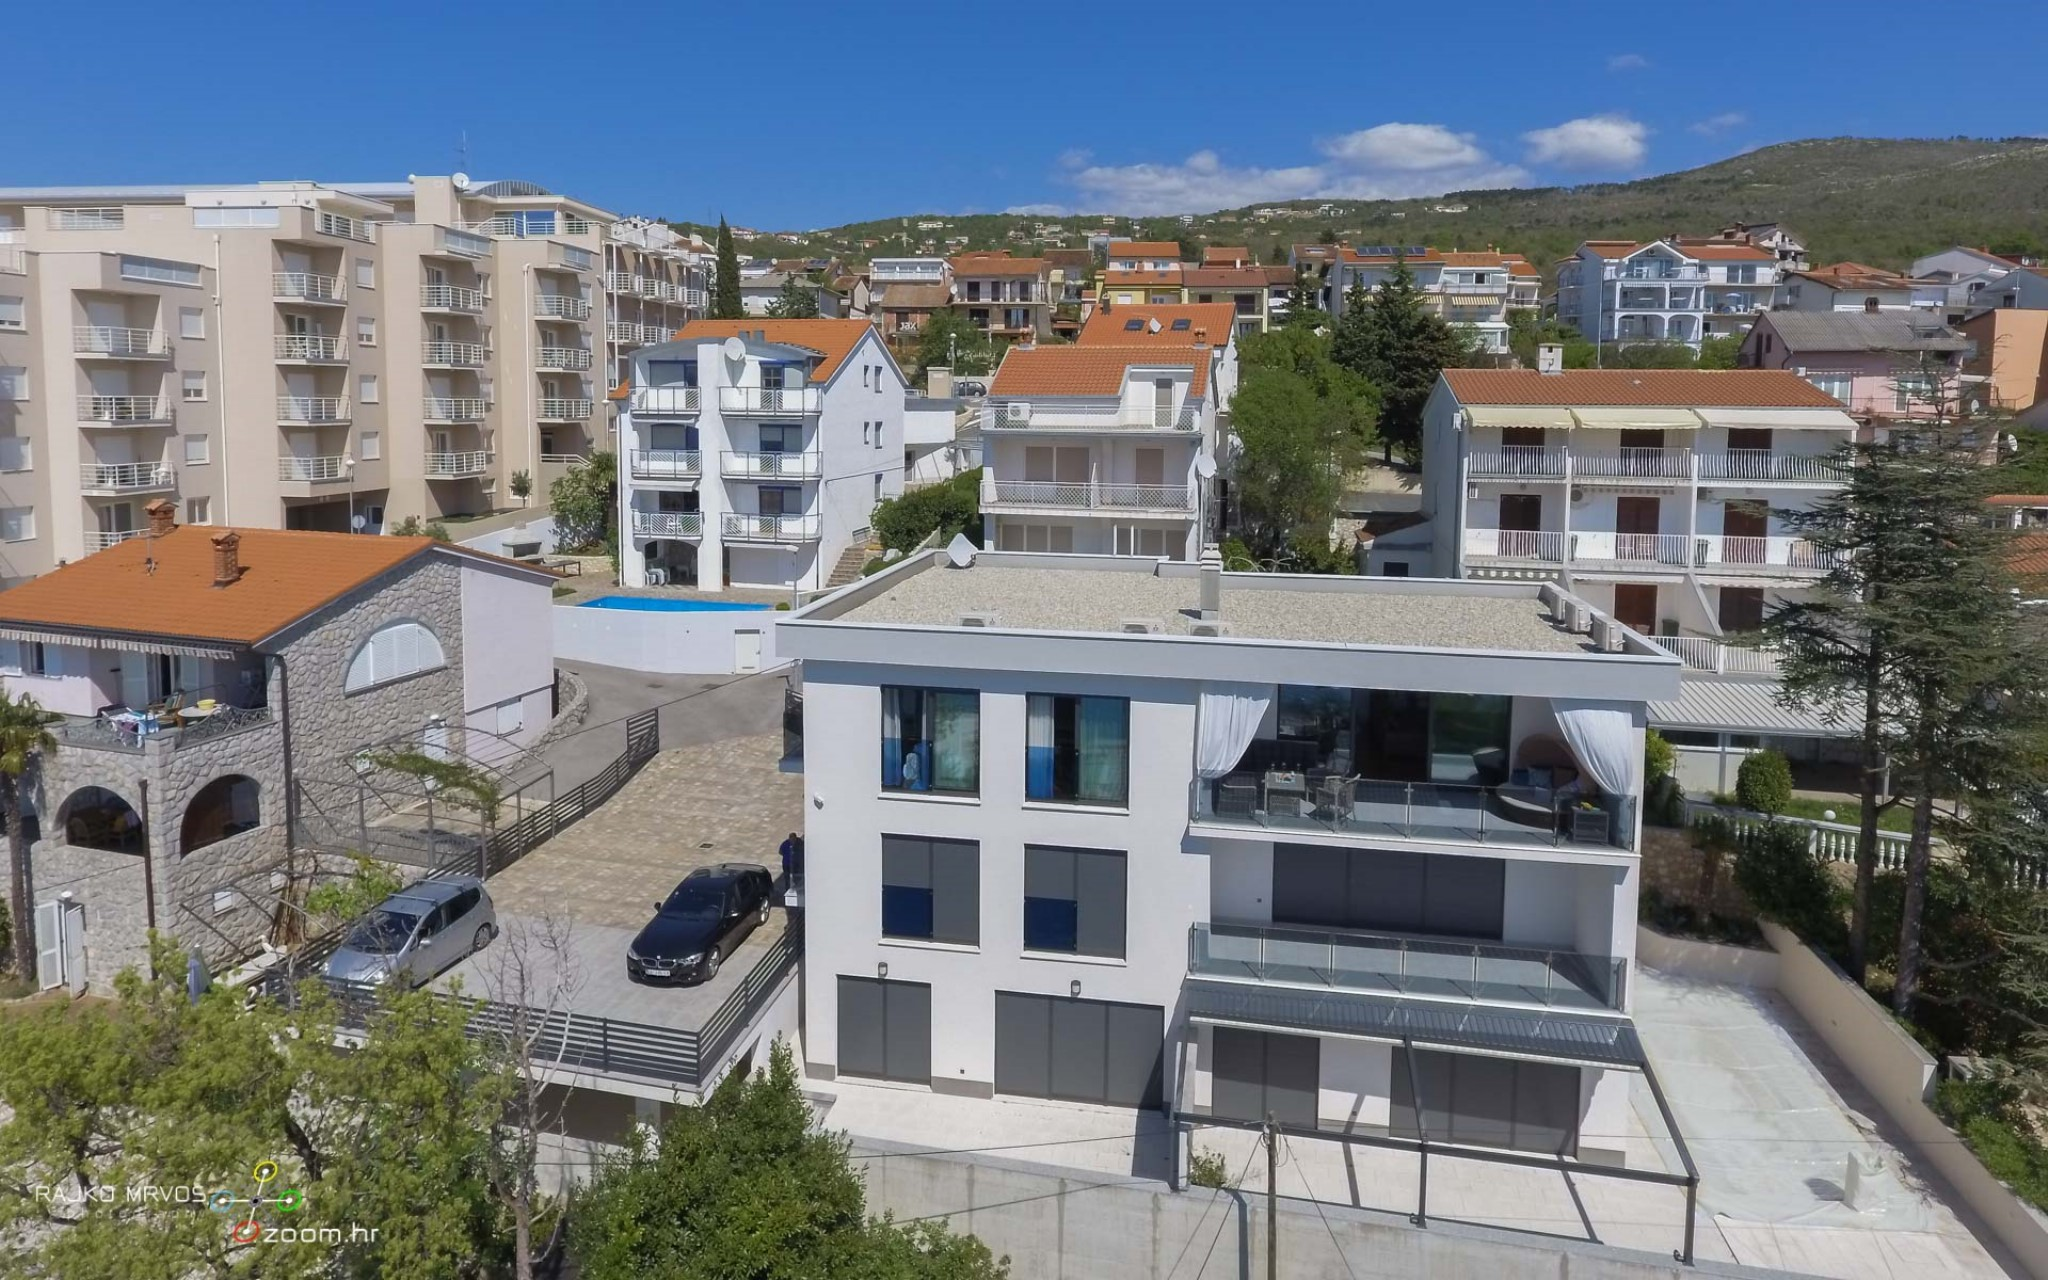 fotografiranje-iz-zraka-eksterijera-dronom-vila-kuca-hotela-apartmana-Larimar-Penthouse-55